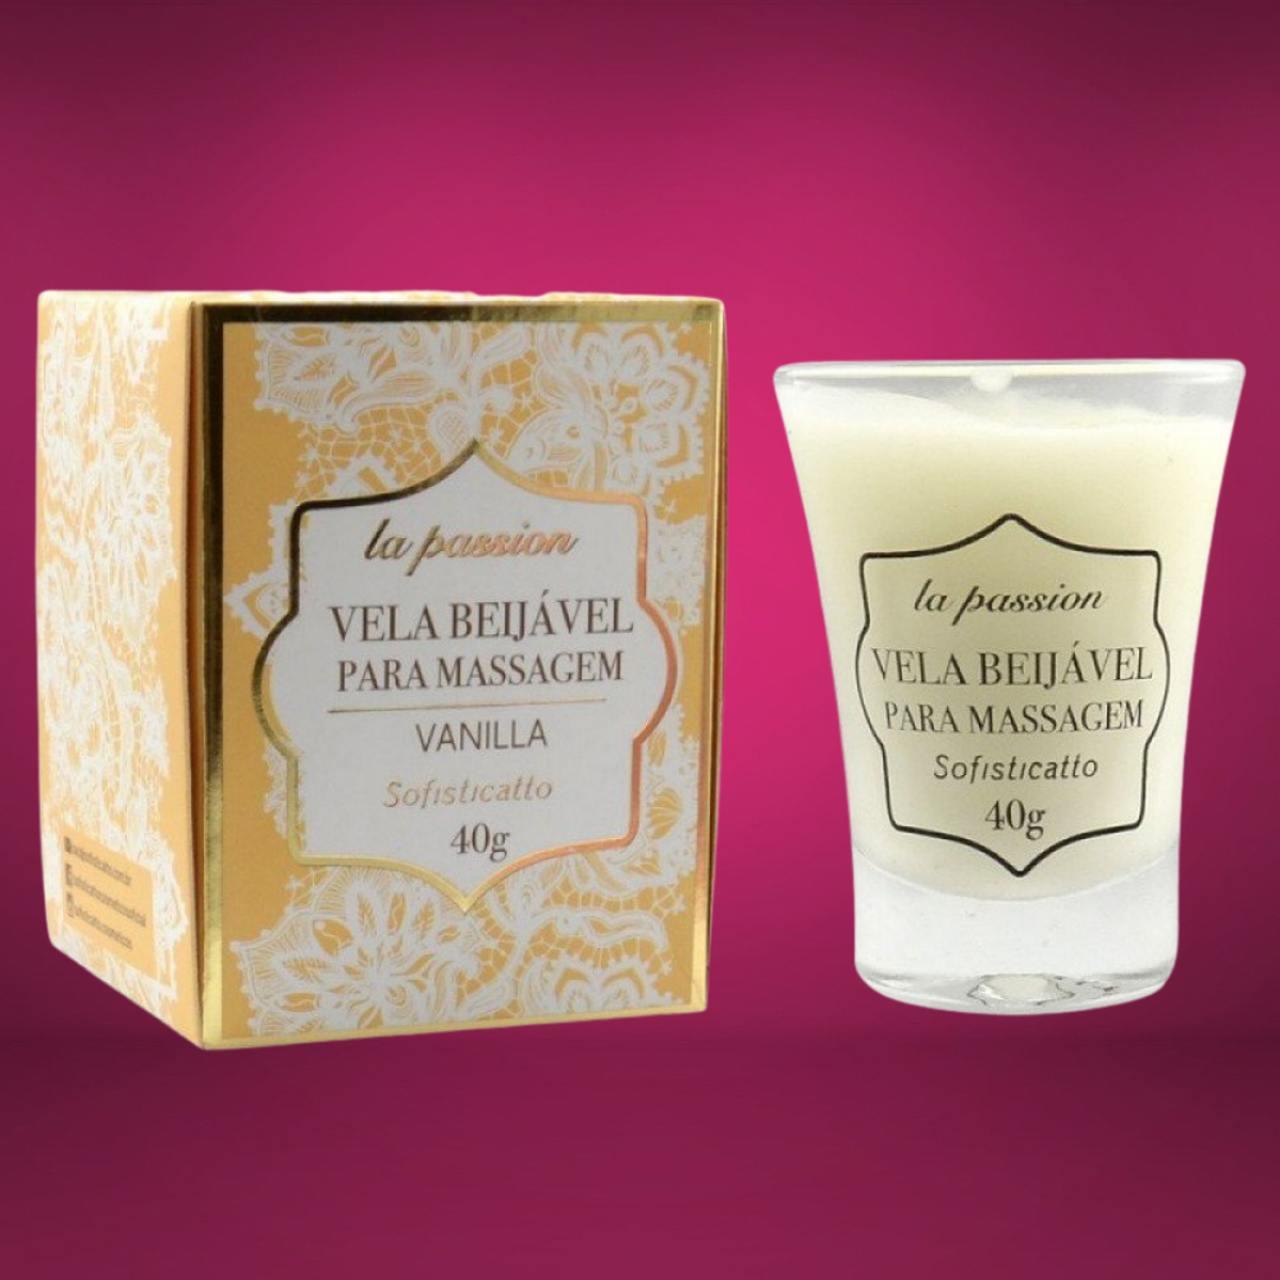 Vela Erótica Beijável para Massaagem Vanilla 40g Sofisticatto